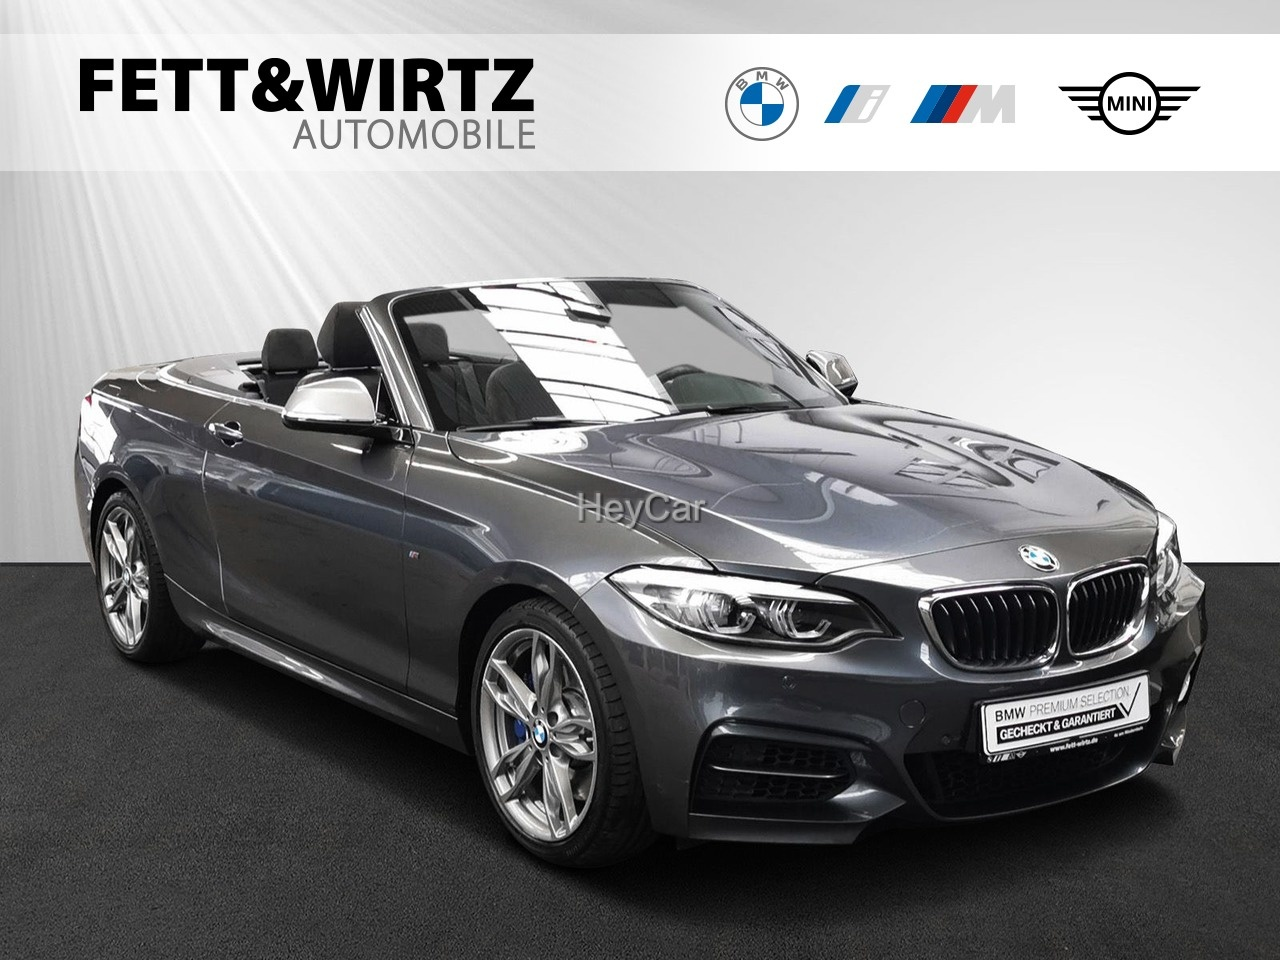 BMW M240i xDrive Cabrio NaviProf. PDC H&K, Jahr 2018, Benzin